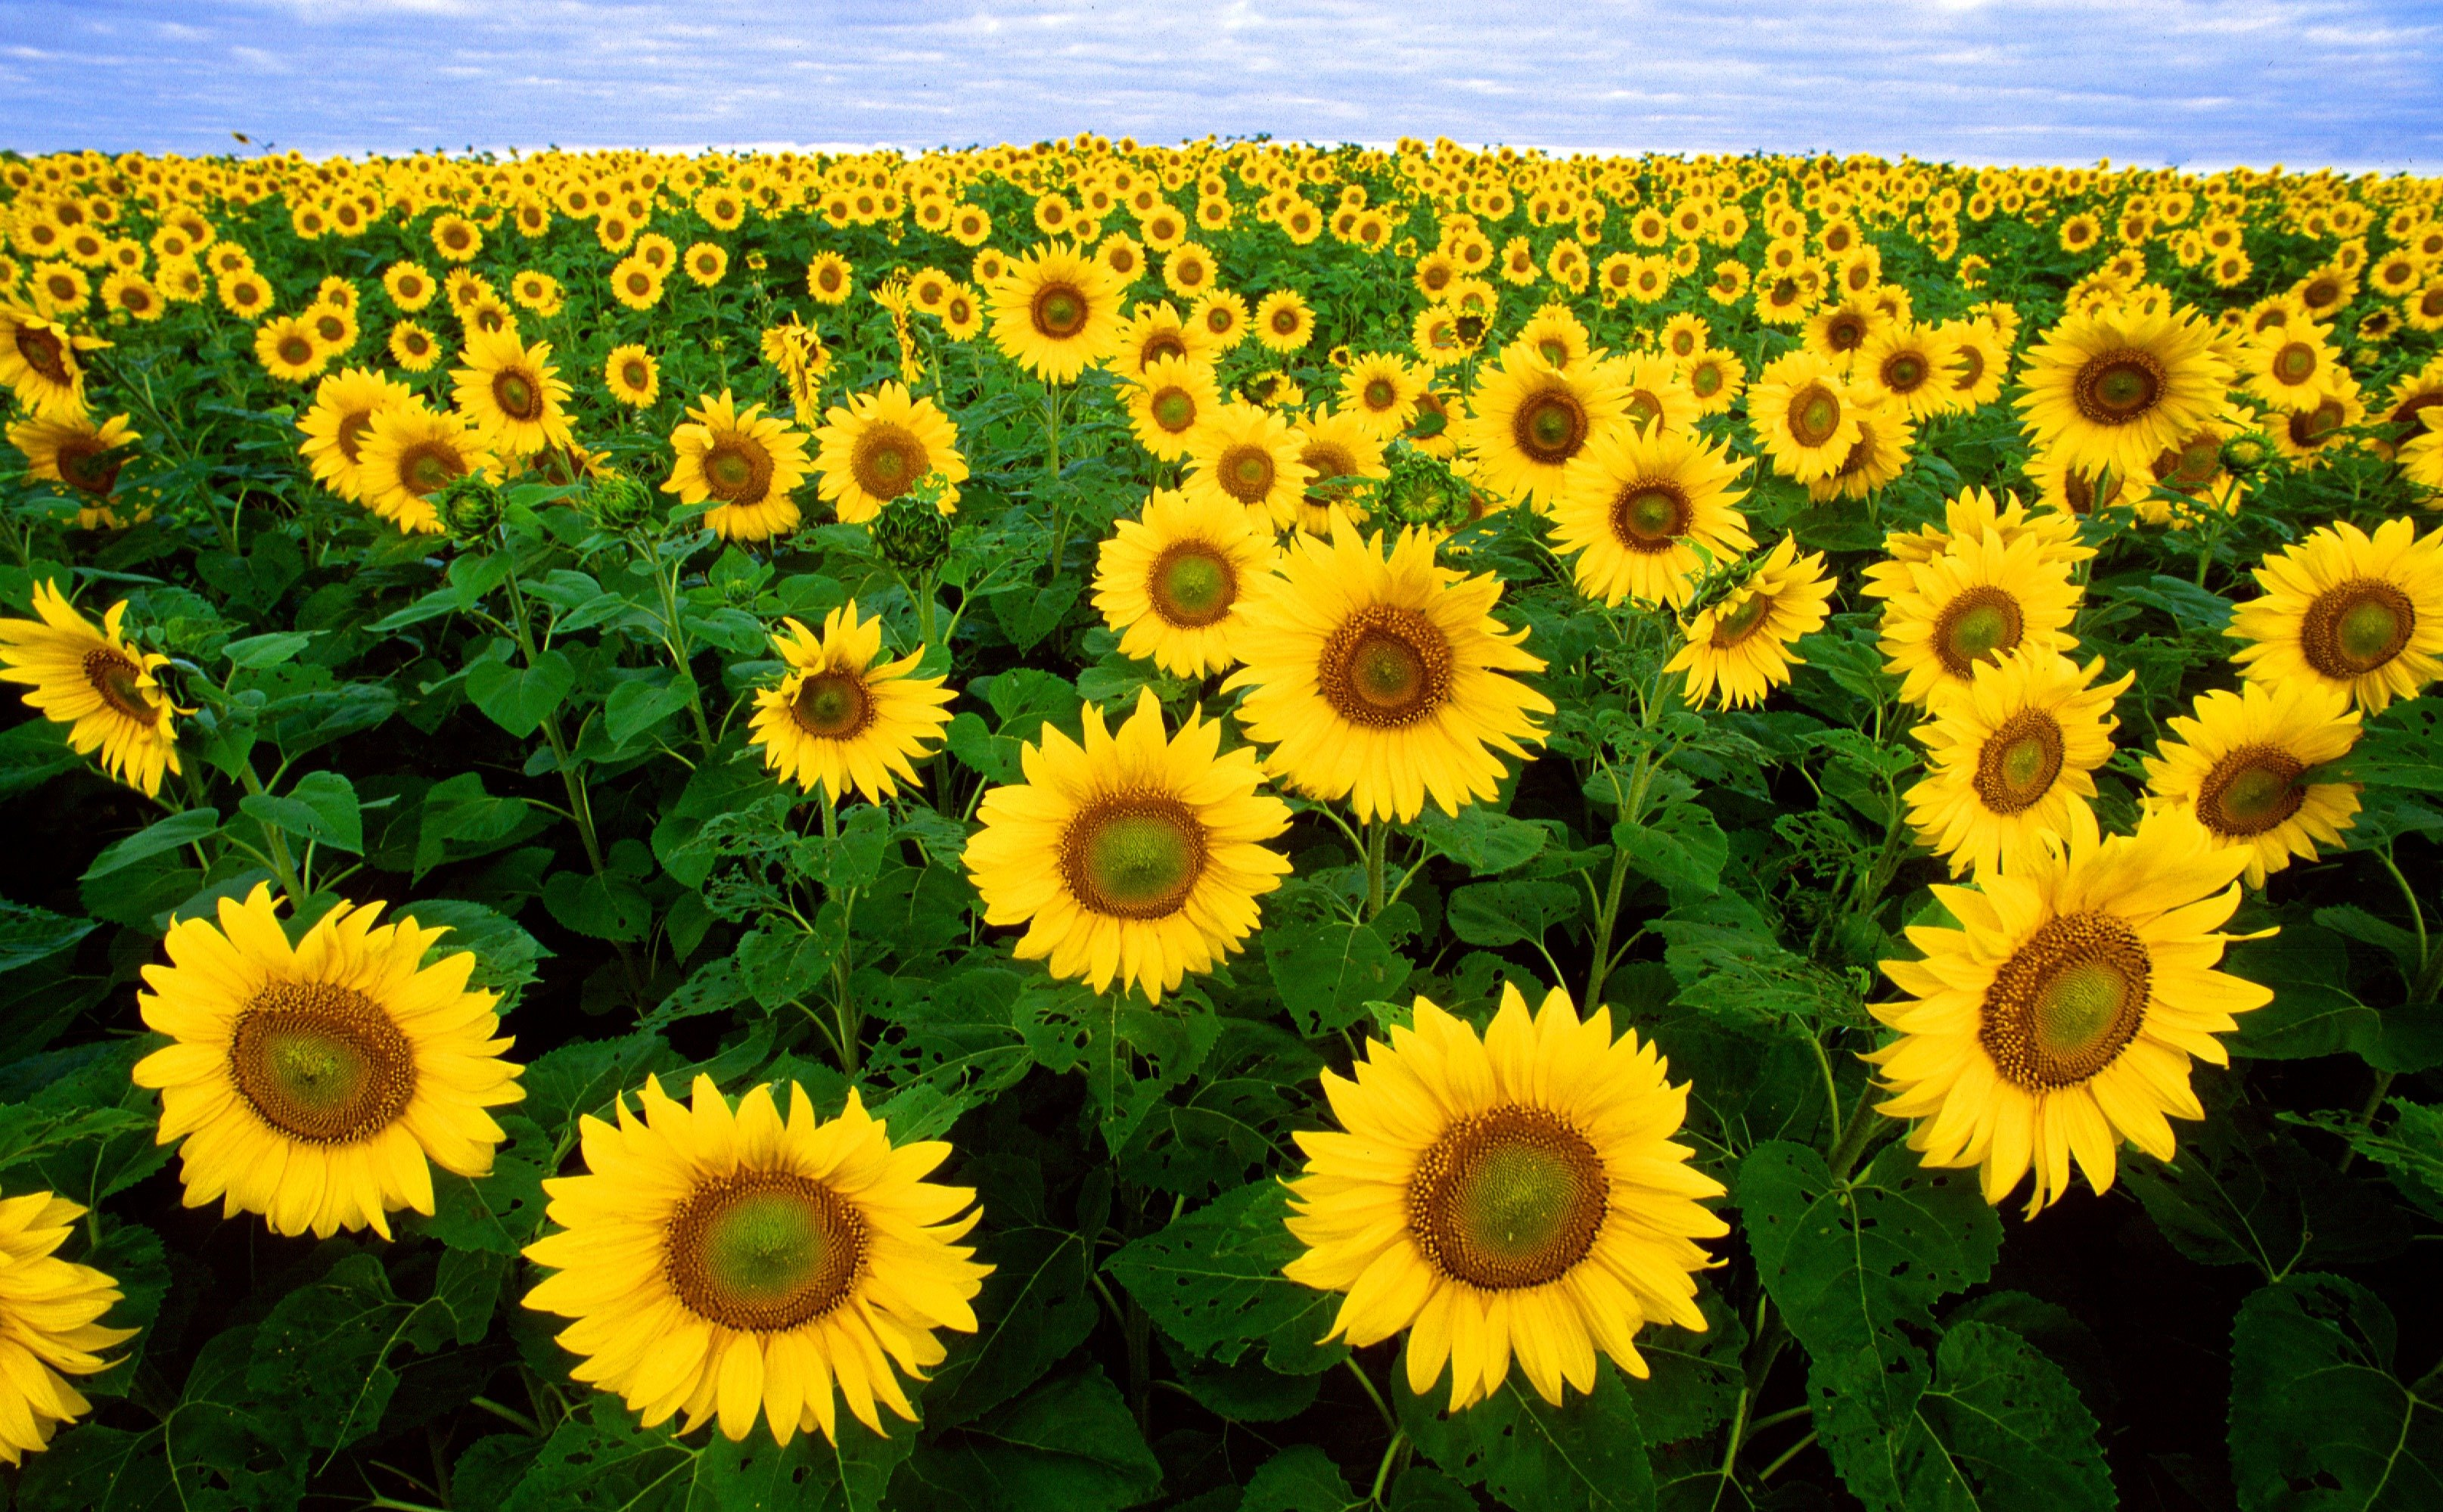 Cat Friendly Flowers - Sunflowers